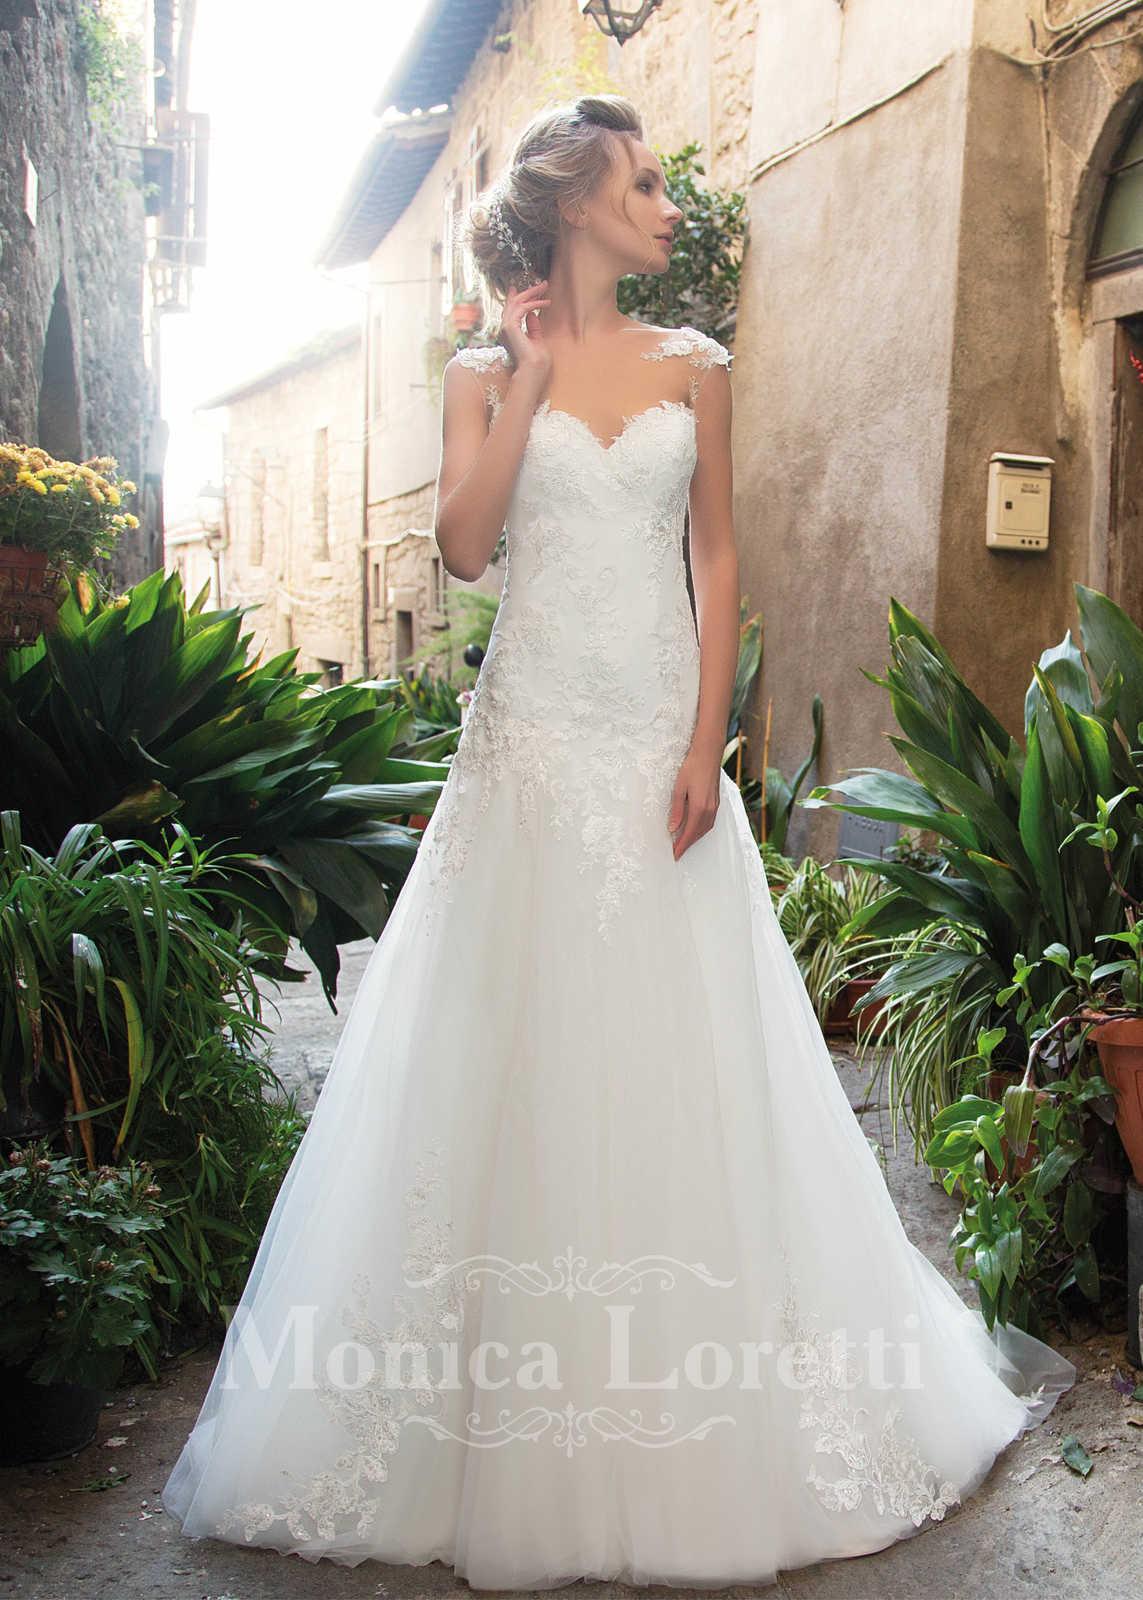 Brautkleid Onelia von Monica Loretti auf Ja.de